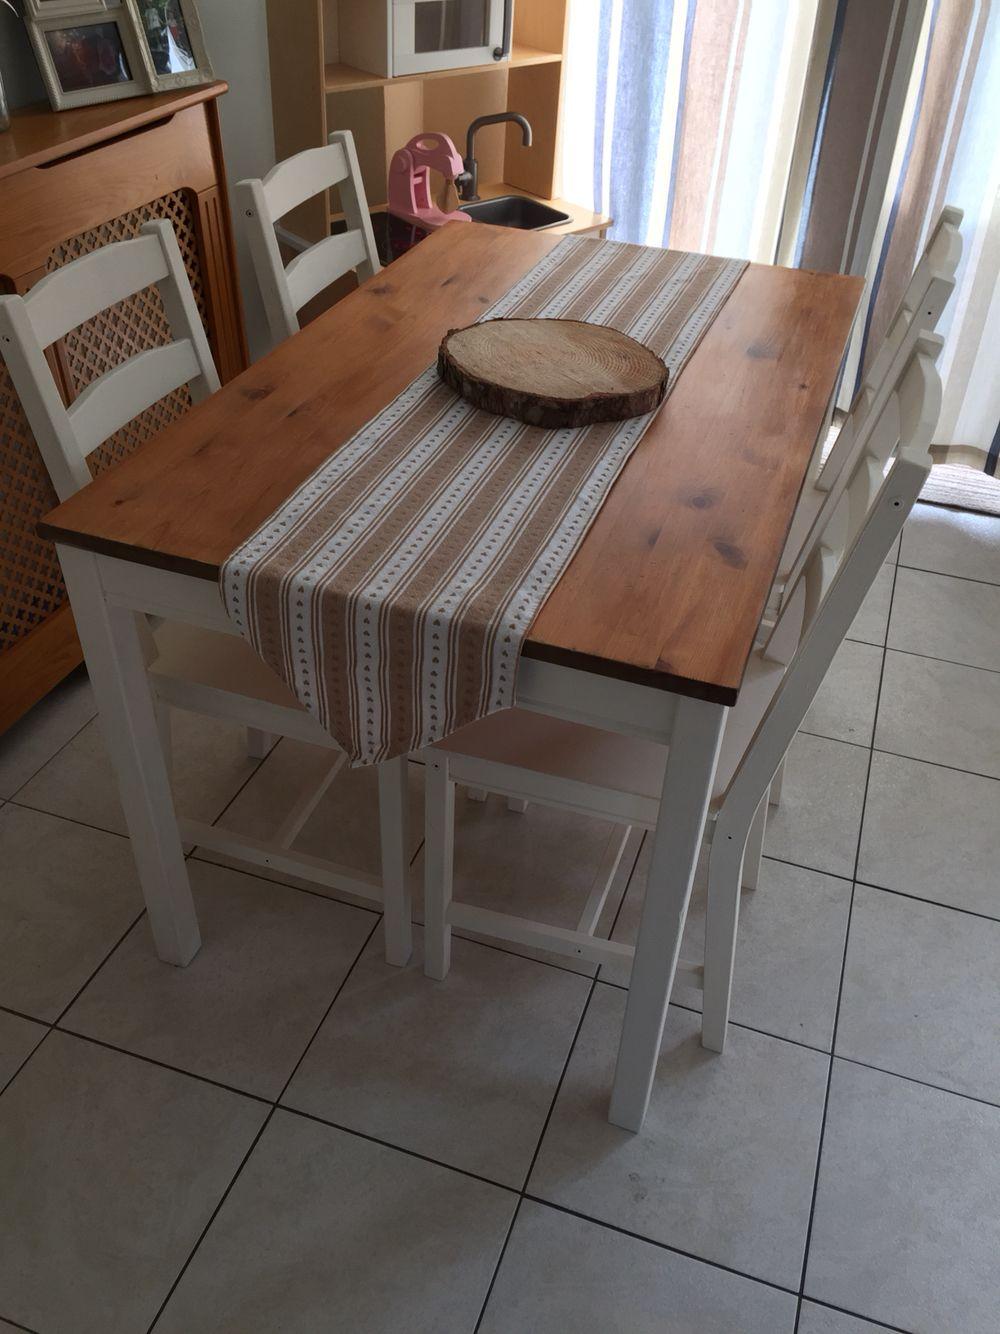 Corner Kitchen Rug Decorative Tile Backsplash Ikea Jokkmokk Dining Table And Chairs Painted In Annie ...